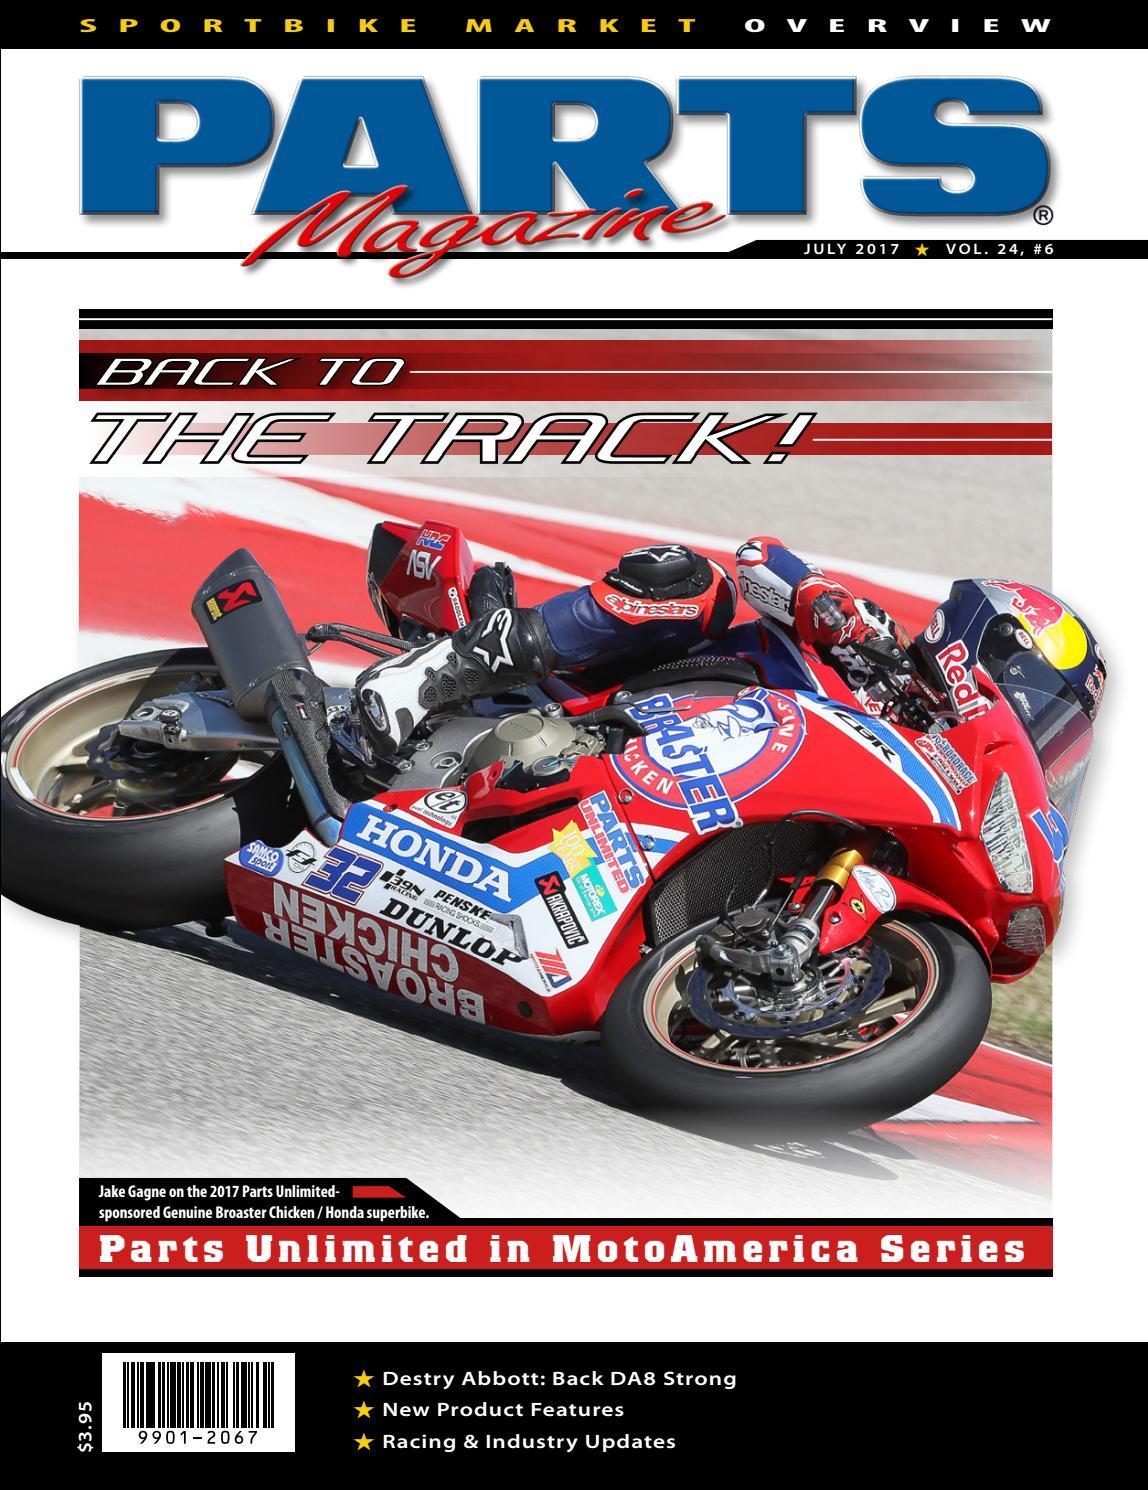 Repsol honda racing moto superbike sponsors tuning patch patch patch